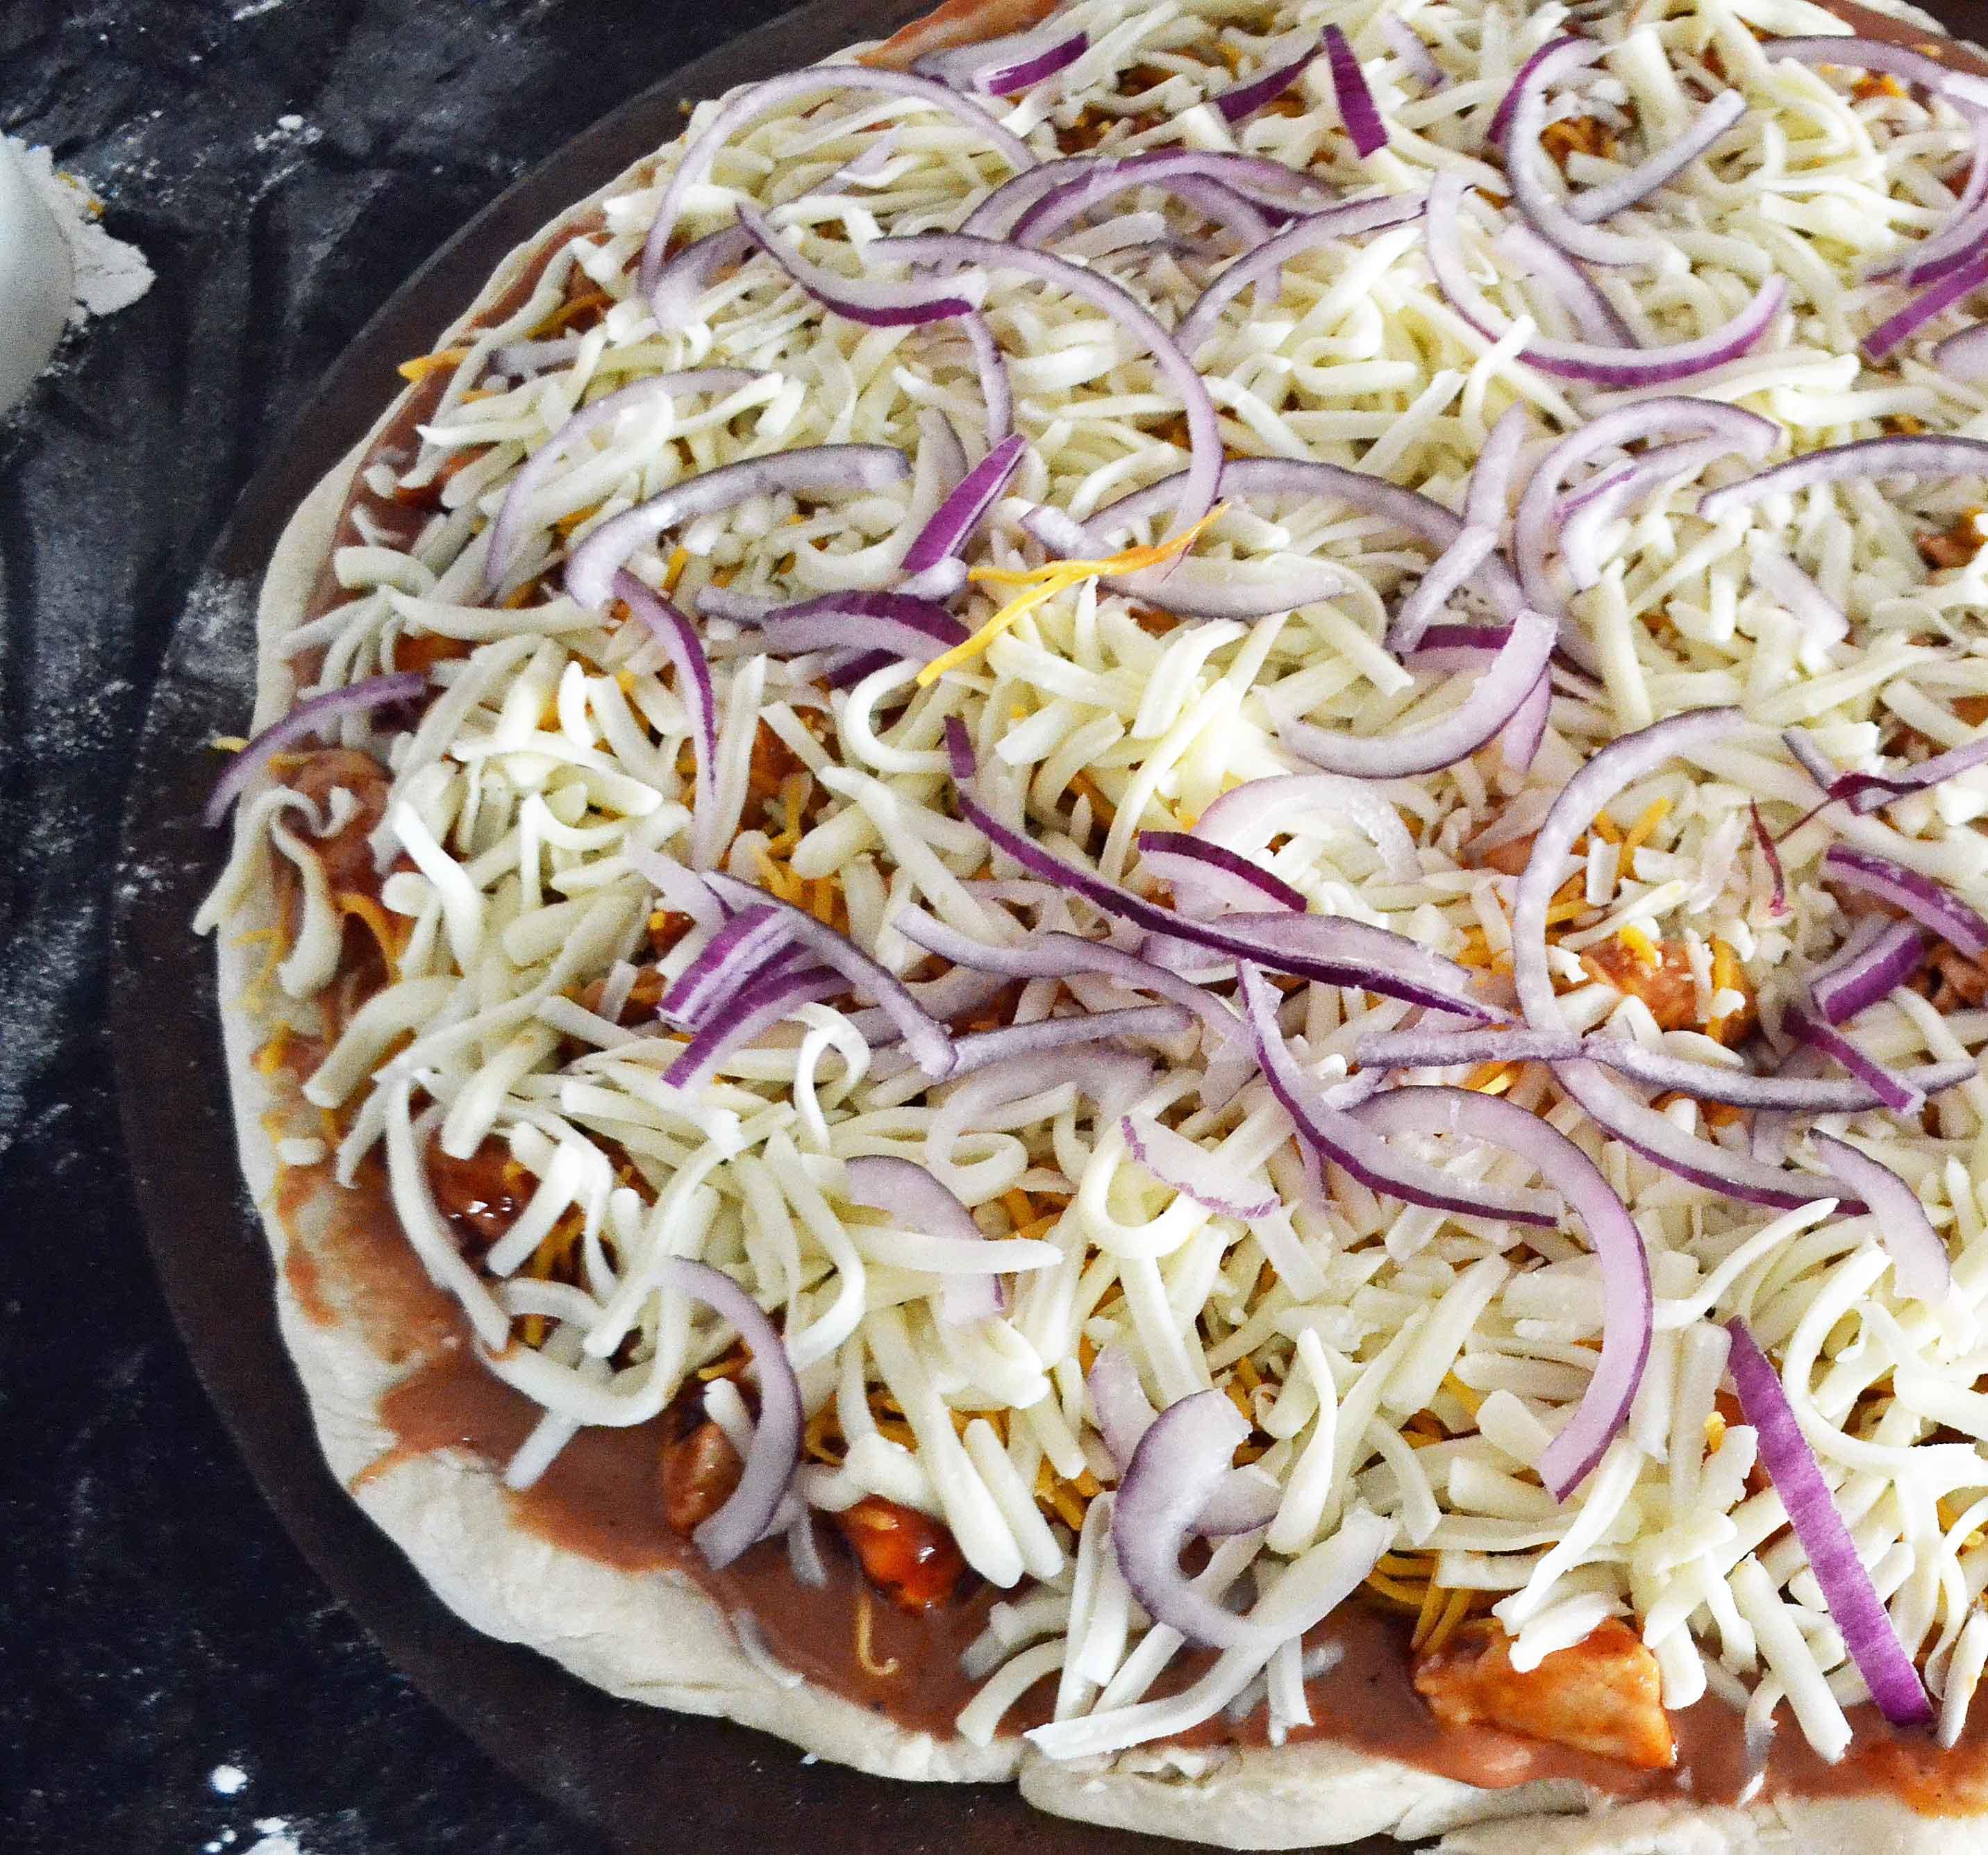 Homemade BBQ Chicken Pizza by Modern Honey www.modernhoney.com